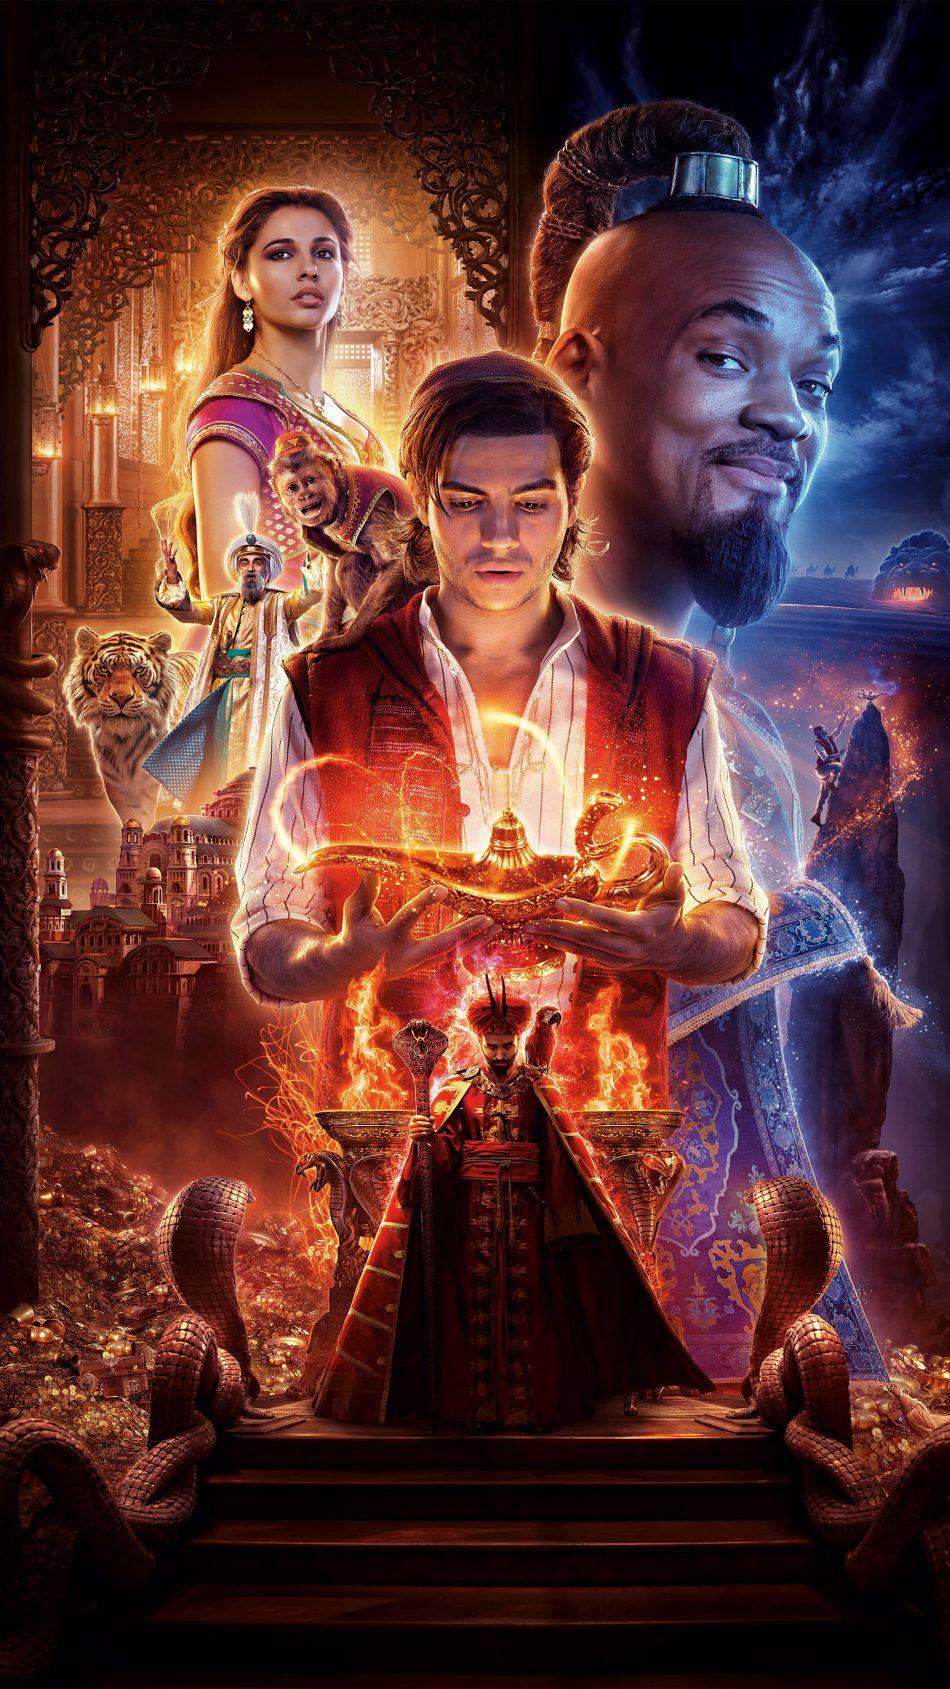 Aladdin 2019 4K Ultra HD Mobile Wallpaper